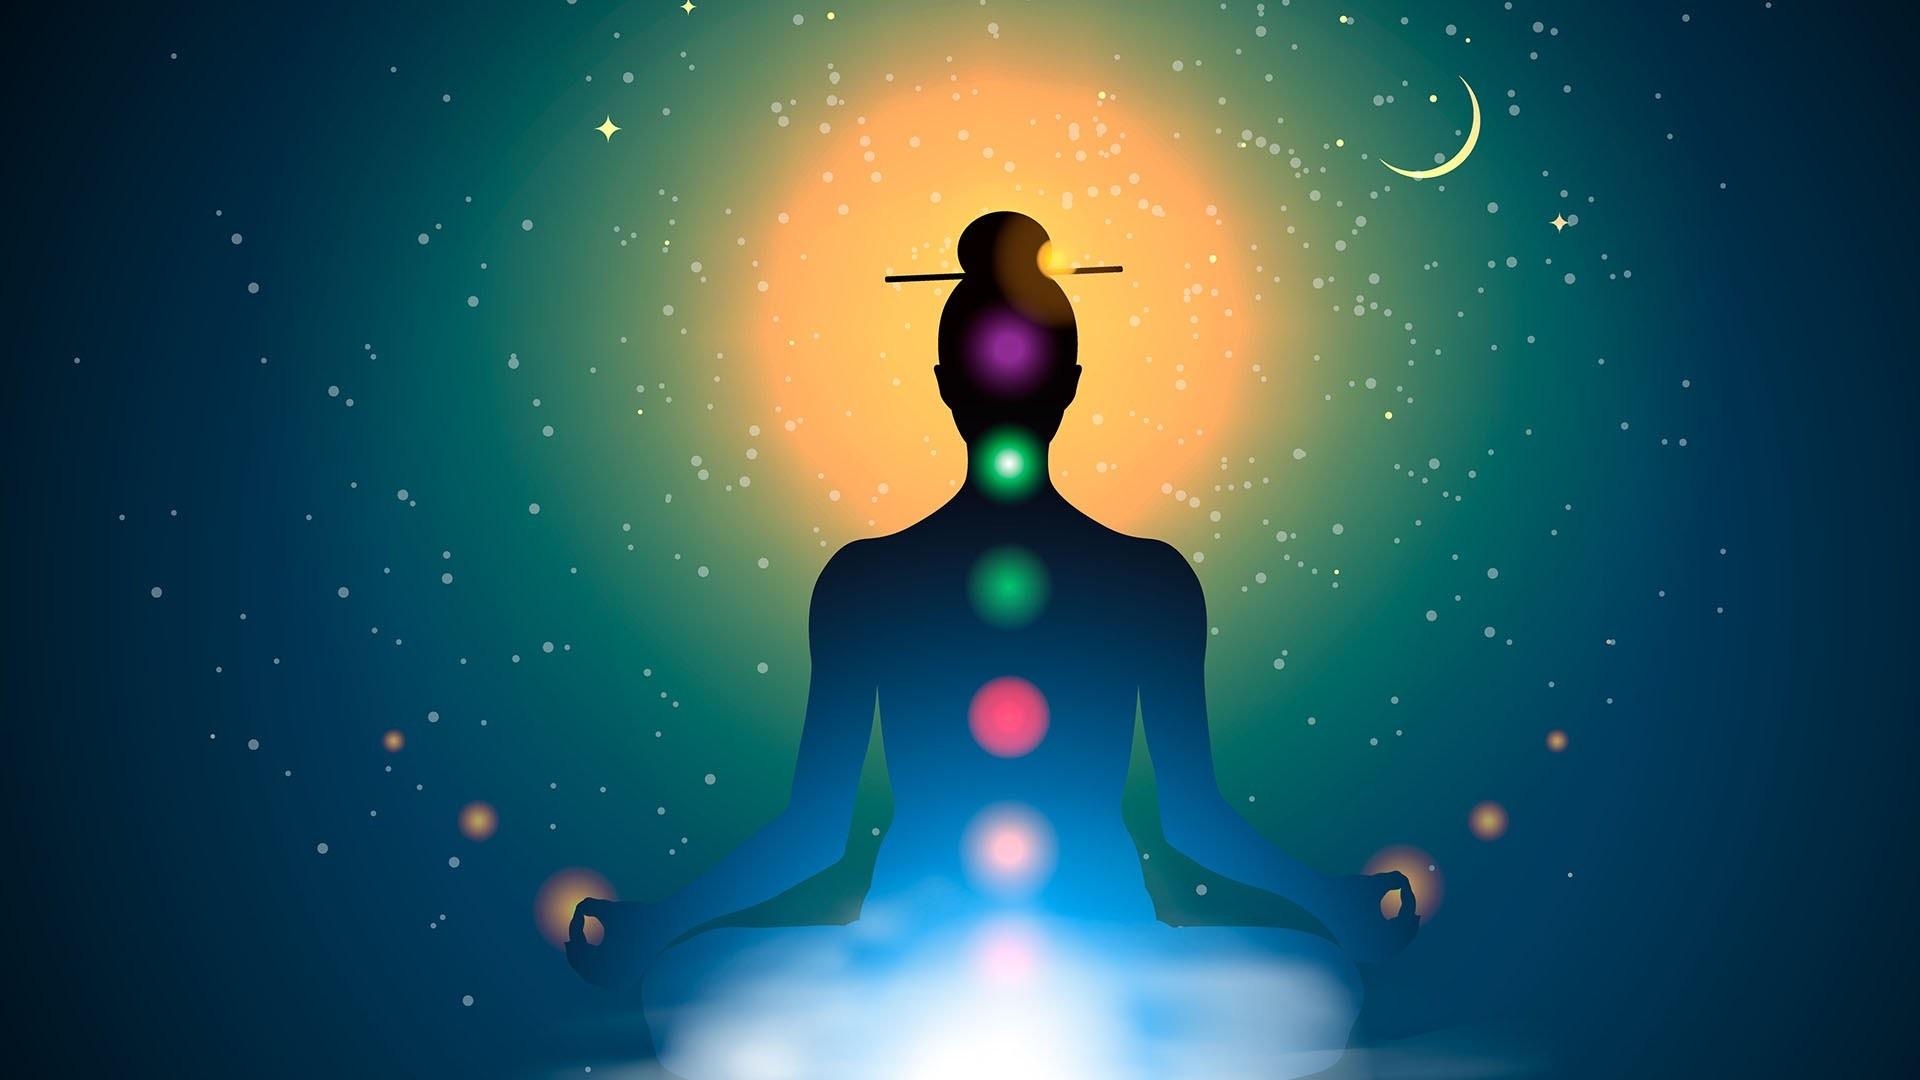 Meditation Wallpaper 73 Pictures